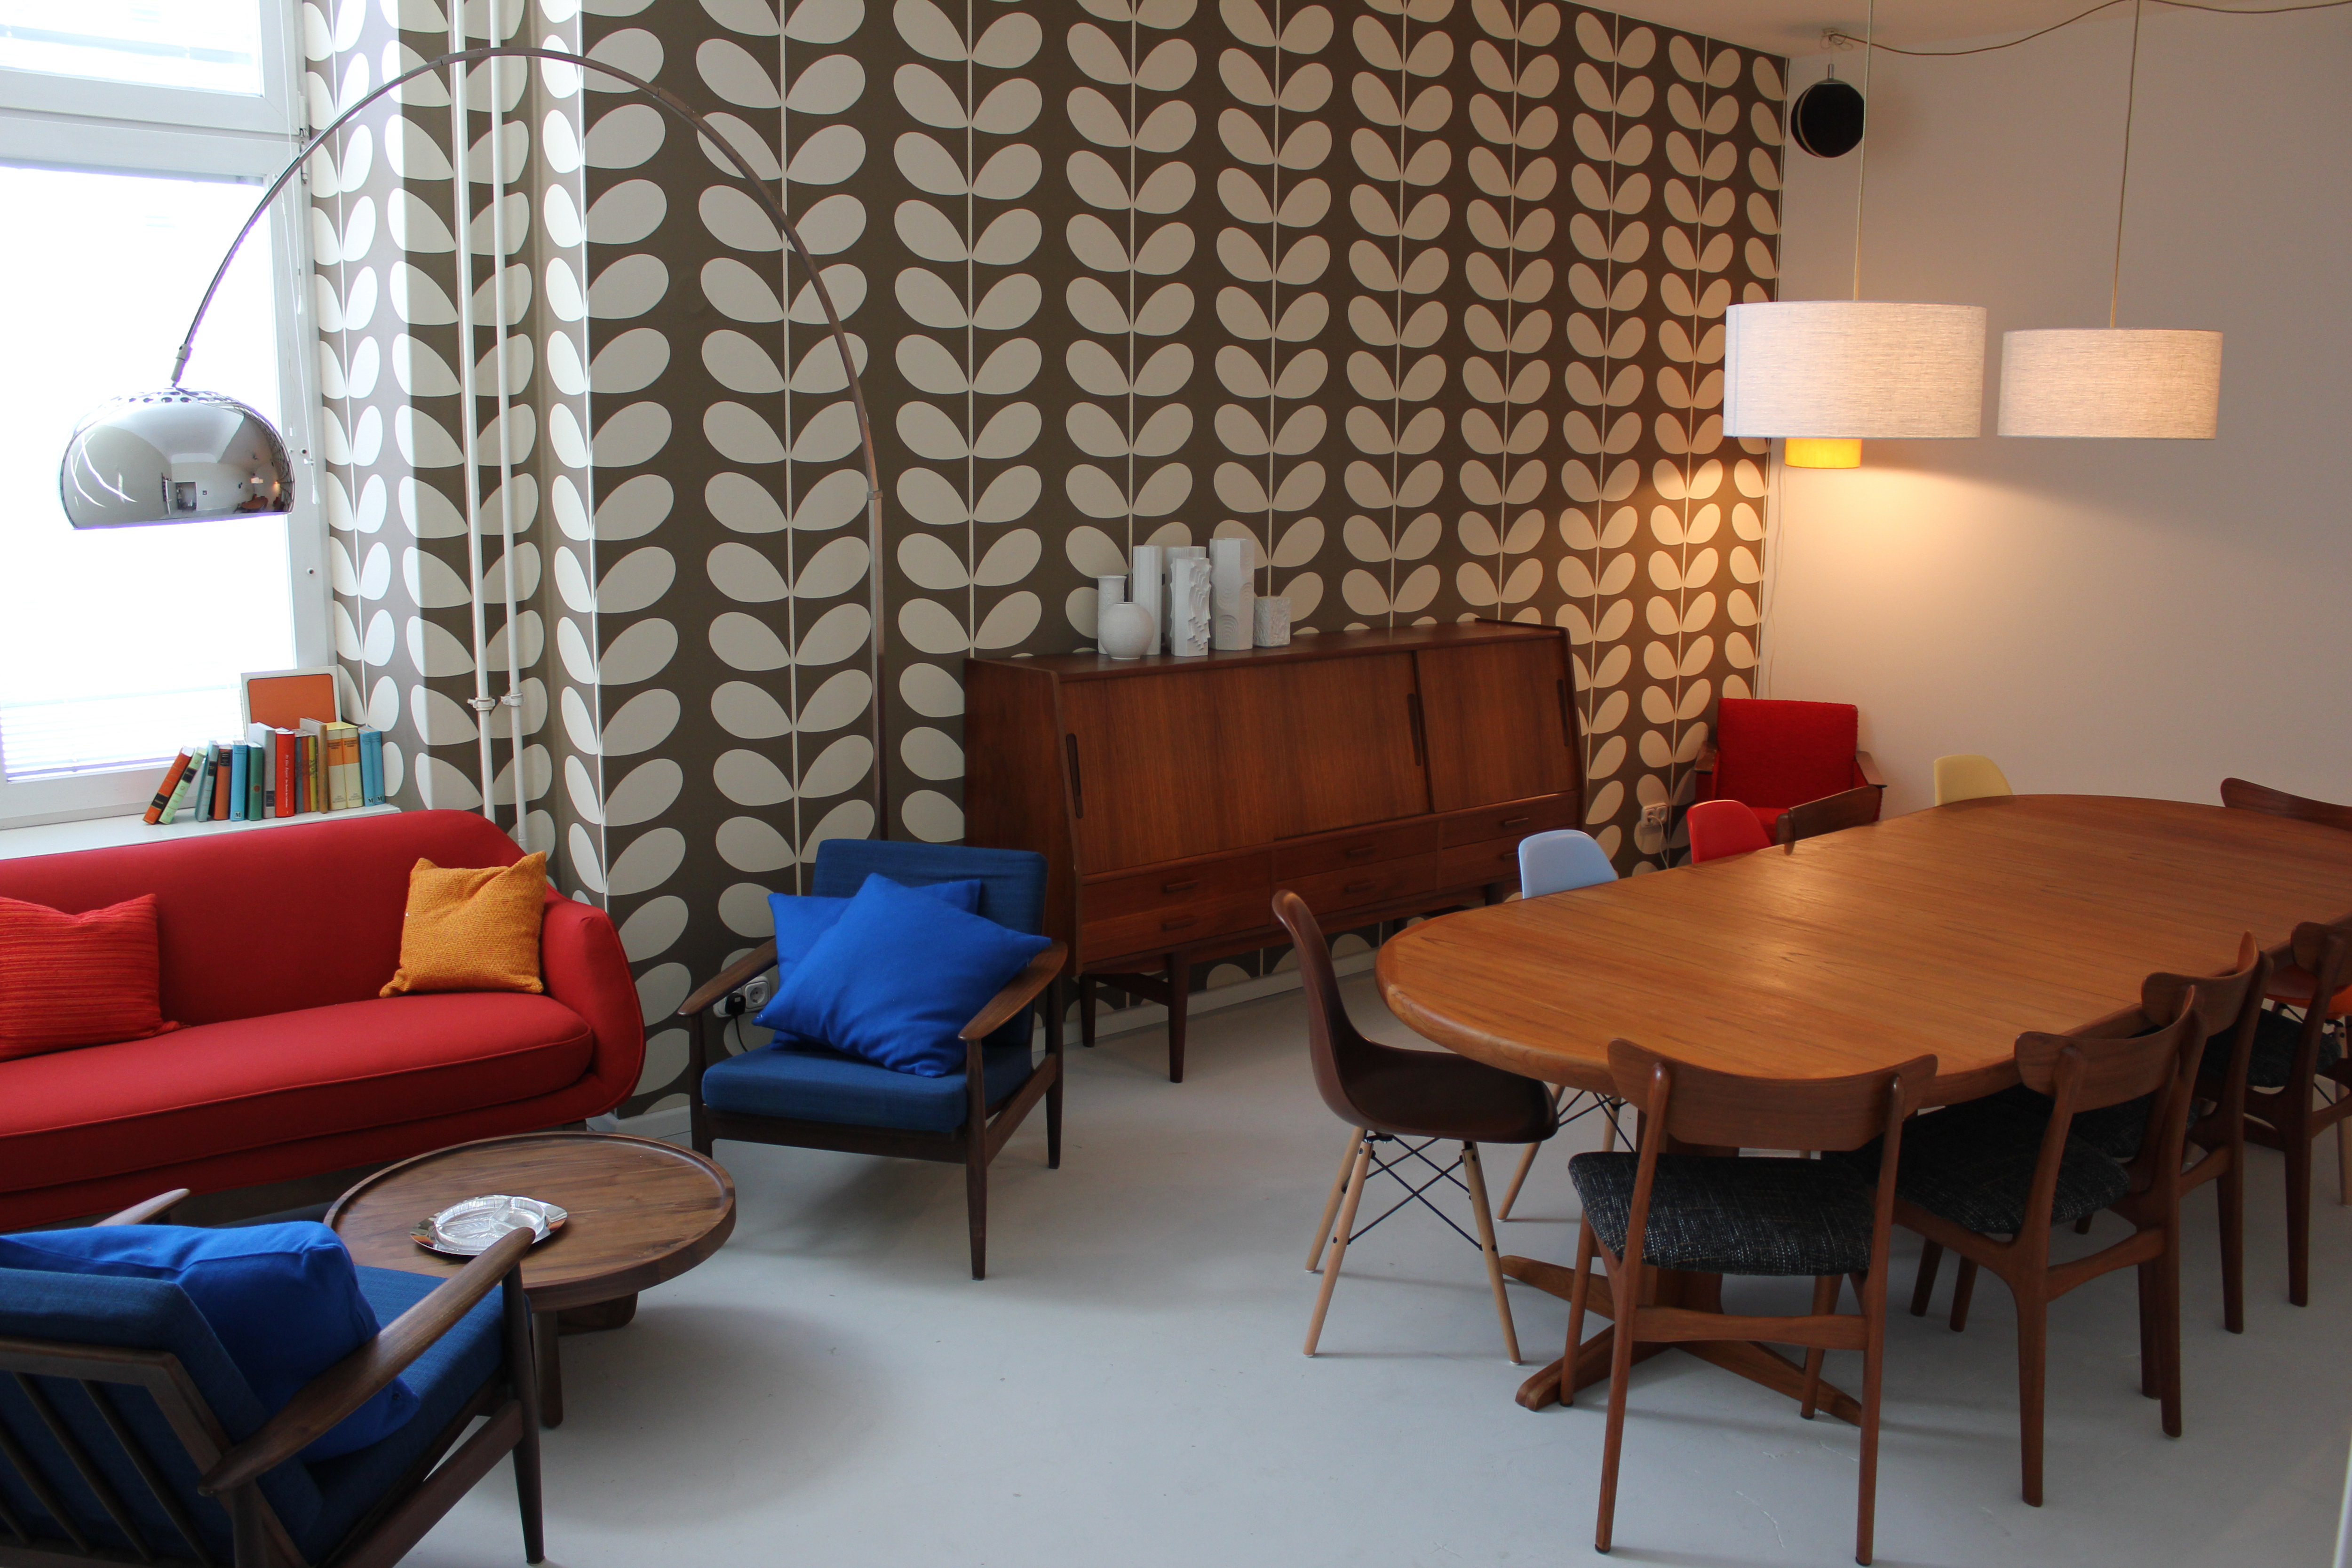 MICHELBERGERHOTEL Conference Room